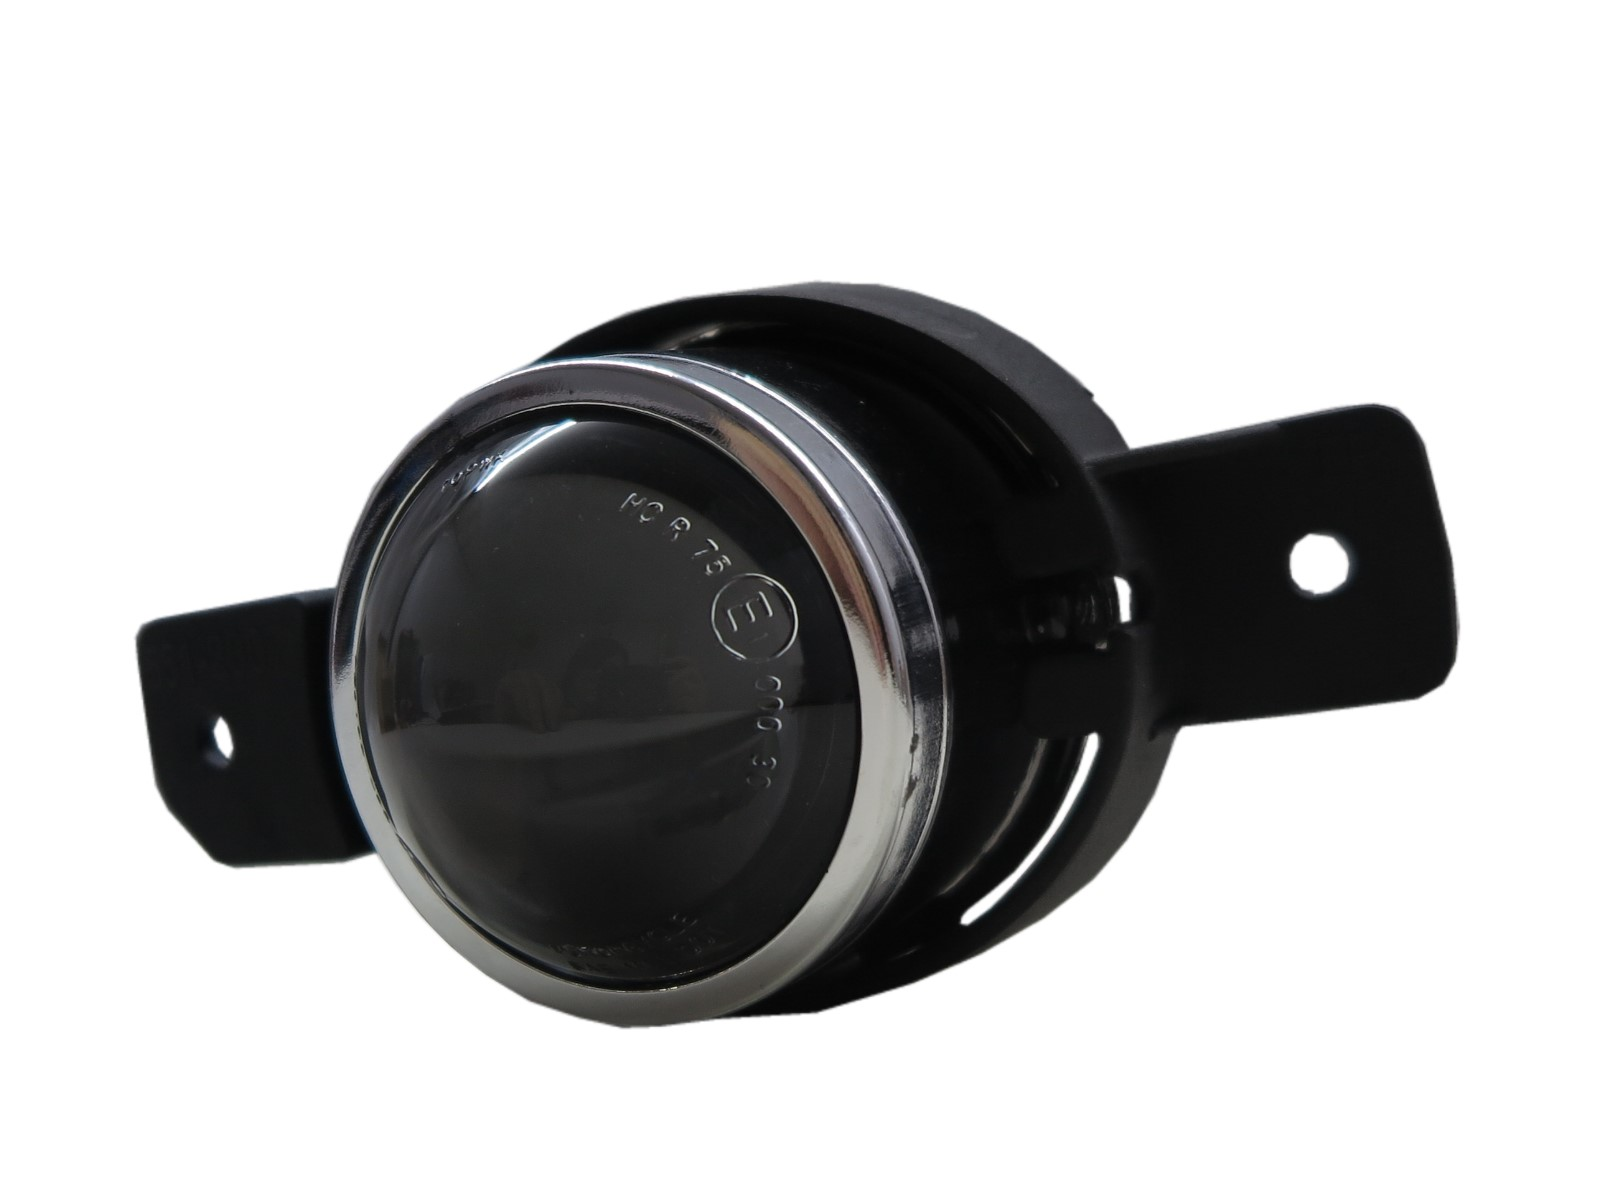 thumbnail 2 - VERSA N17 Second generation 2012-2019 Sedan Projector Fog Light Black for NISSAN